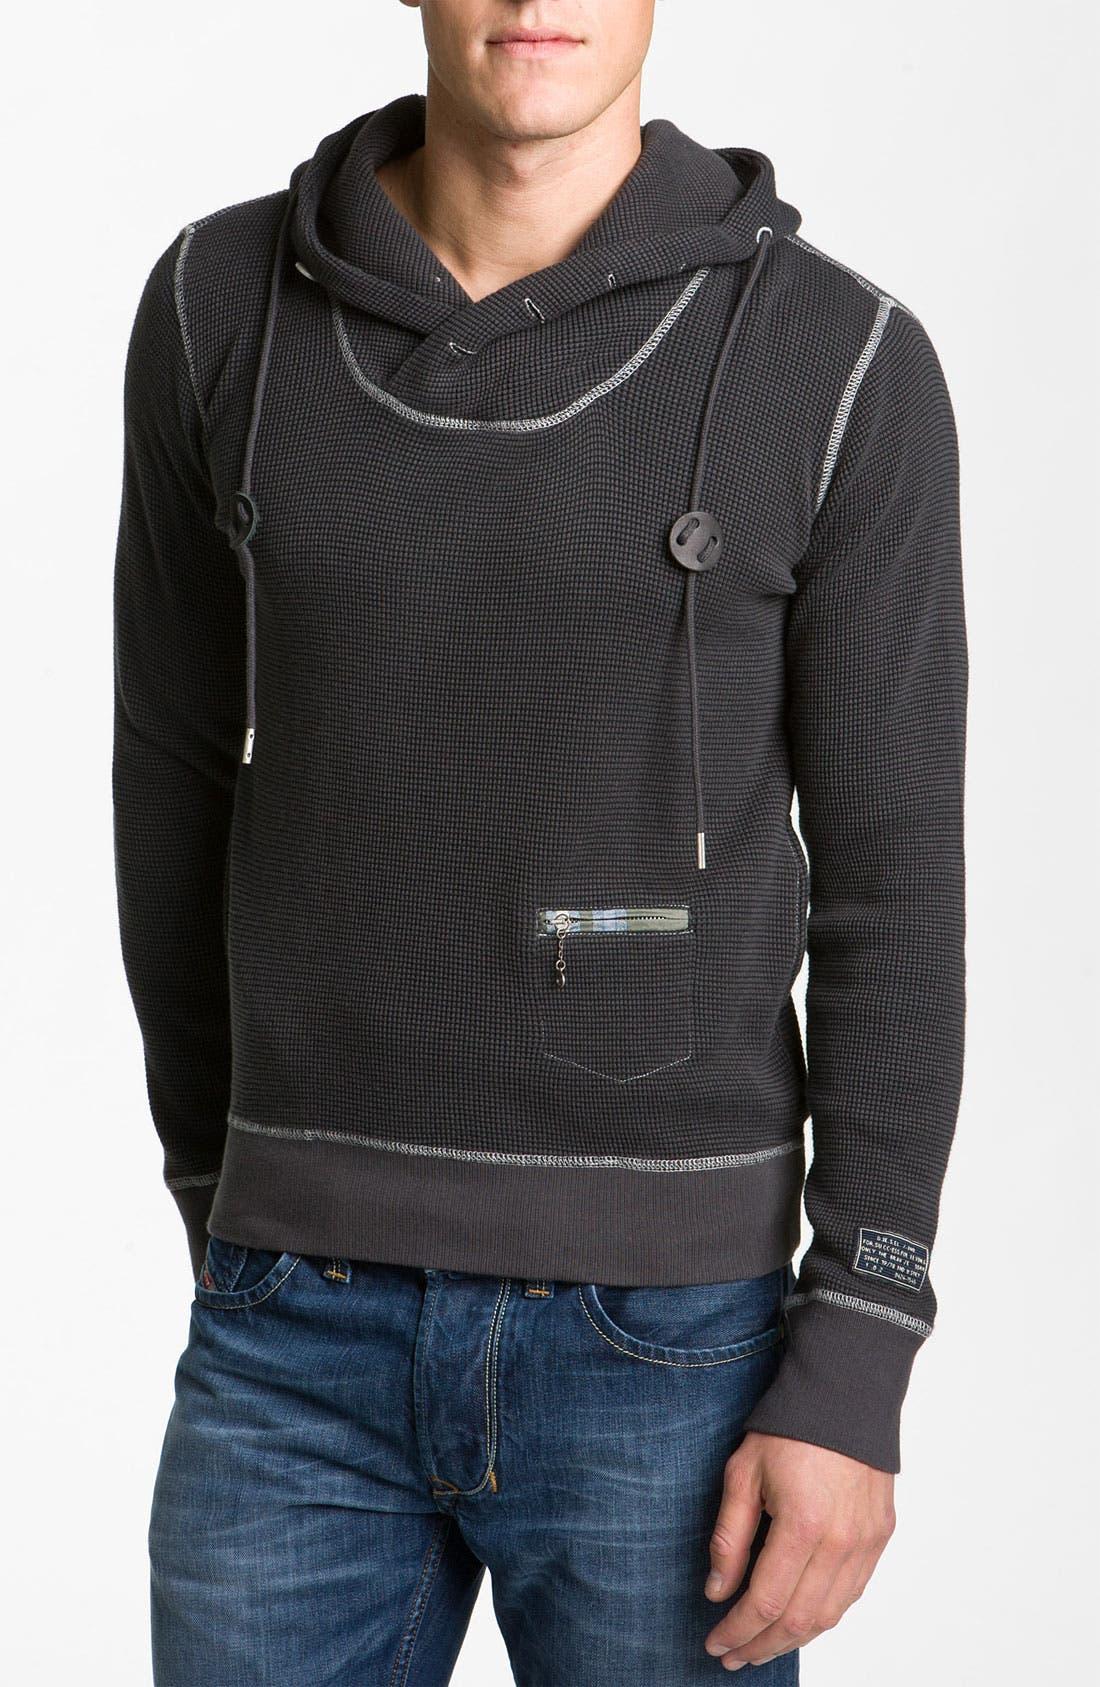 Alternate Image 1 Selected - DIESEL® 'Sybill' Fleece Pullover Sweatshirt